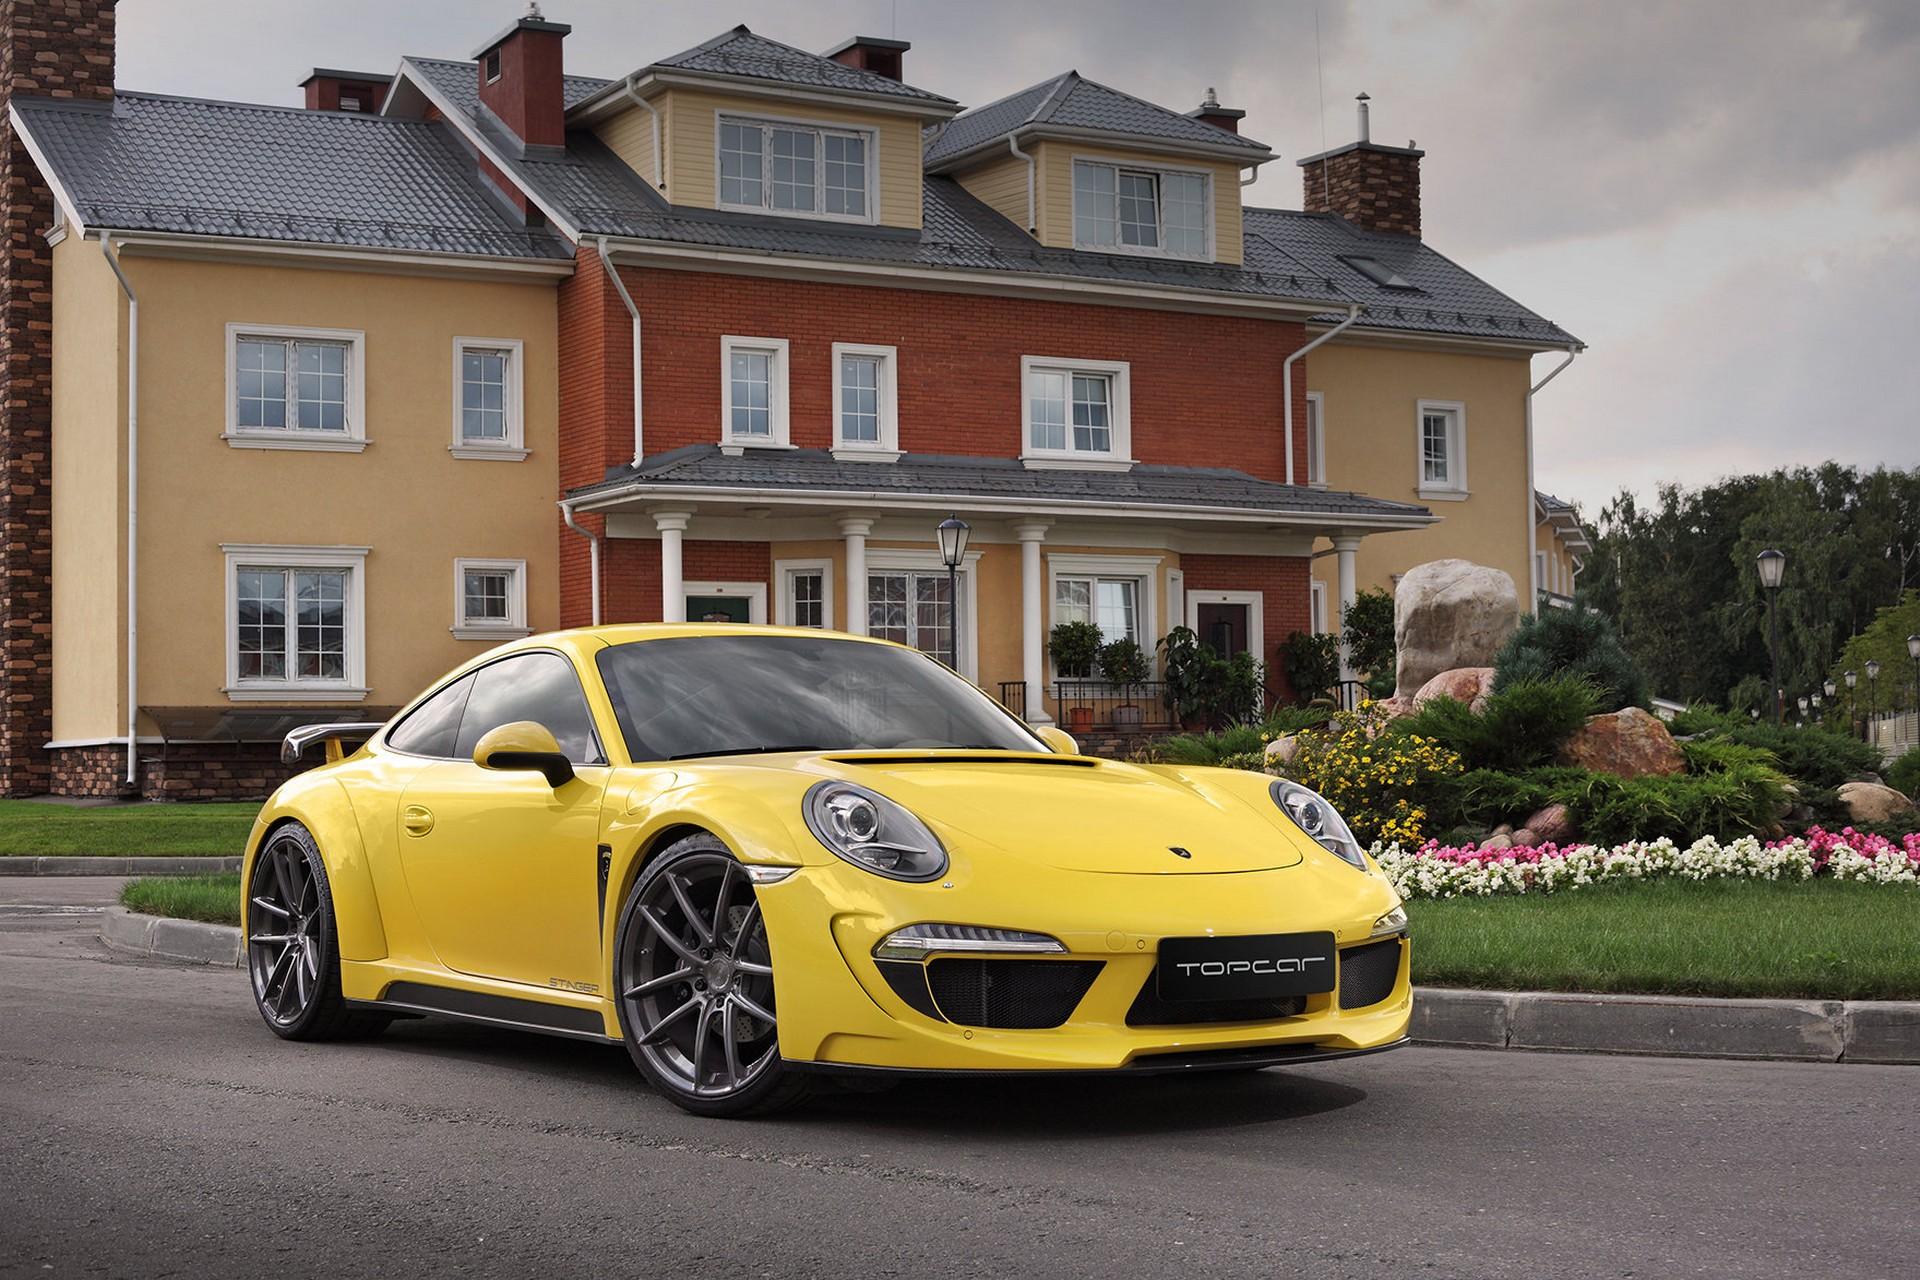 991 carrera stinger yellow topcar switzerland for Portent g3 sl 8